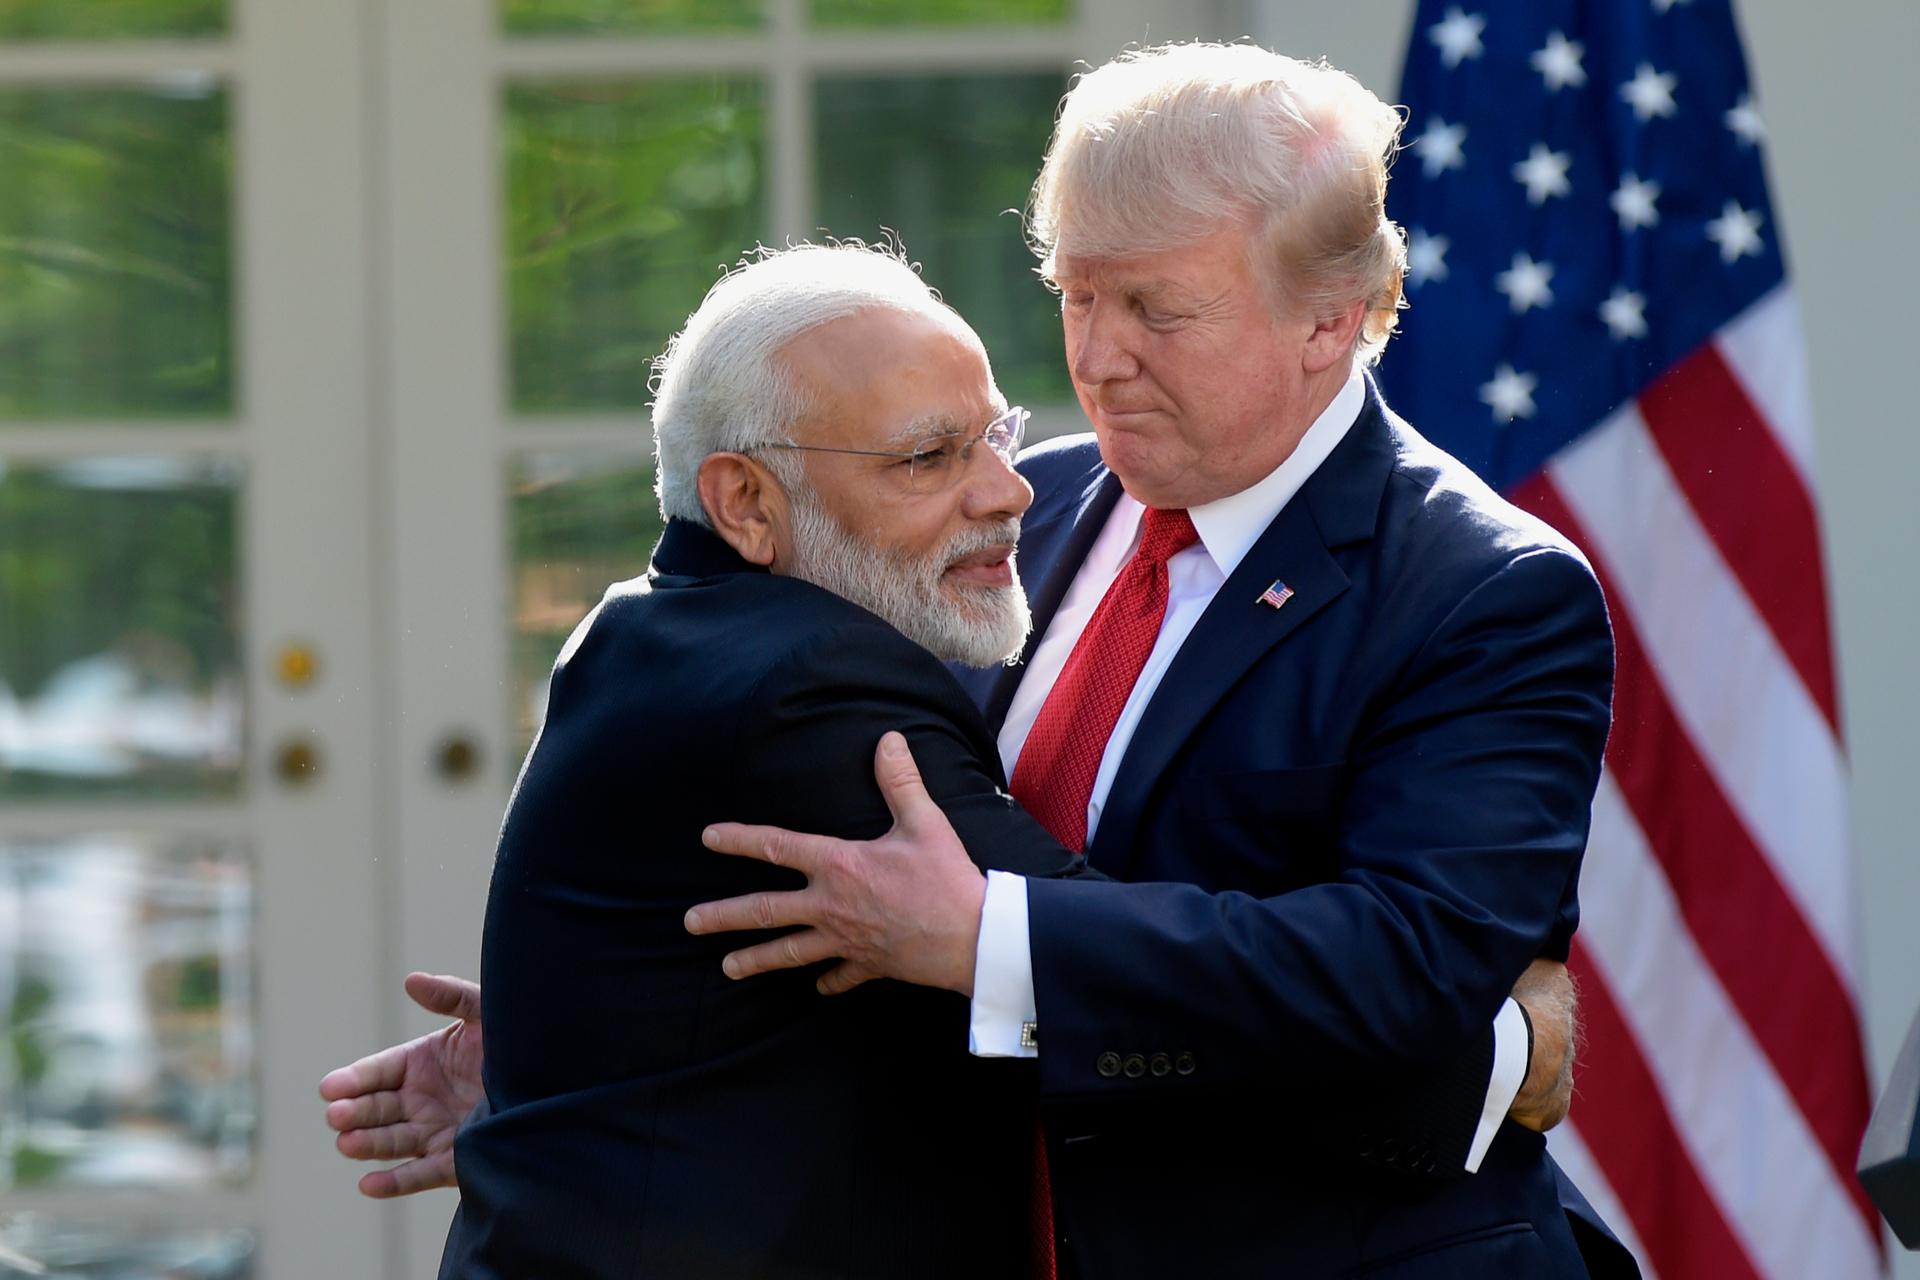 Trump remark left world leader in 'shock'